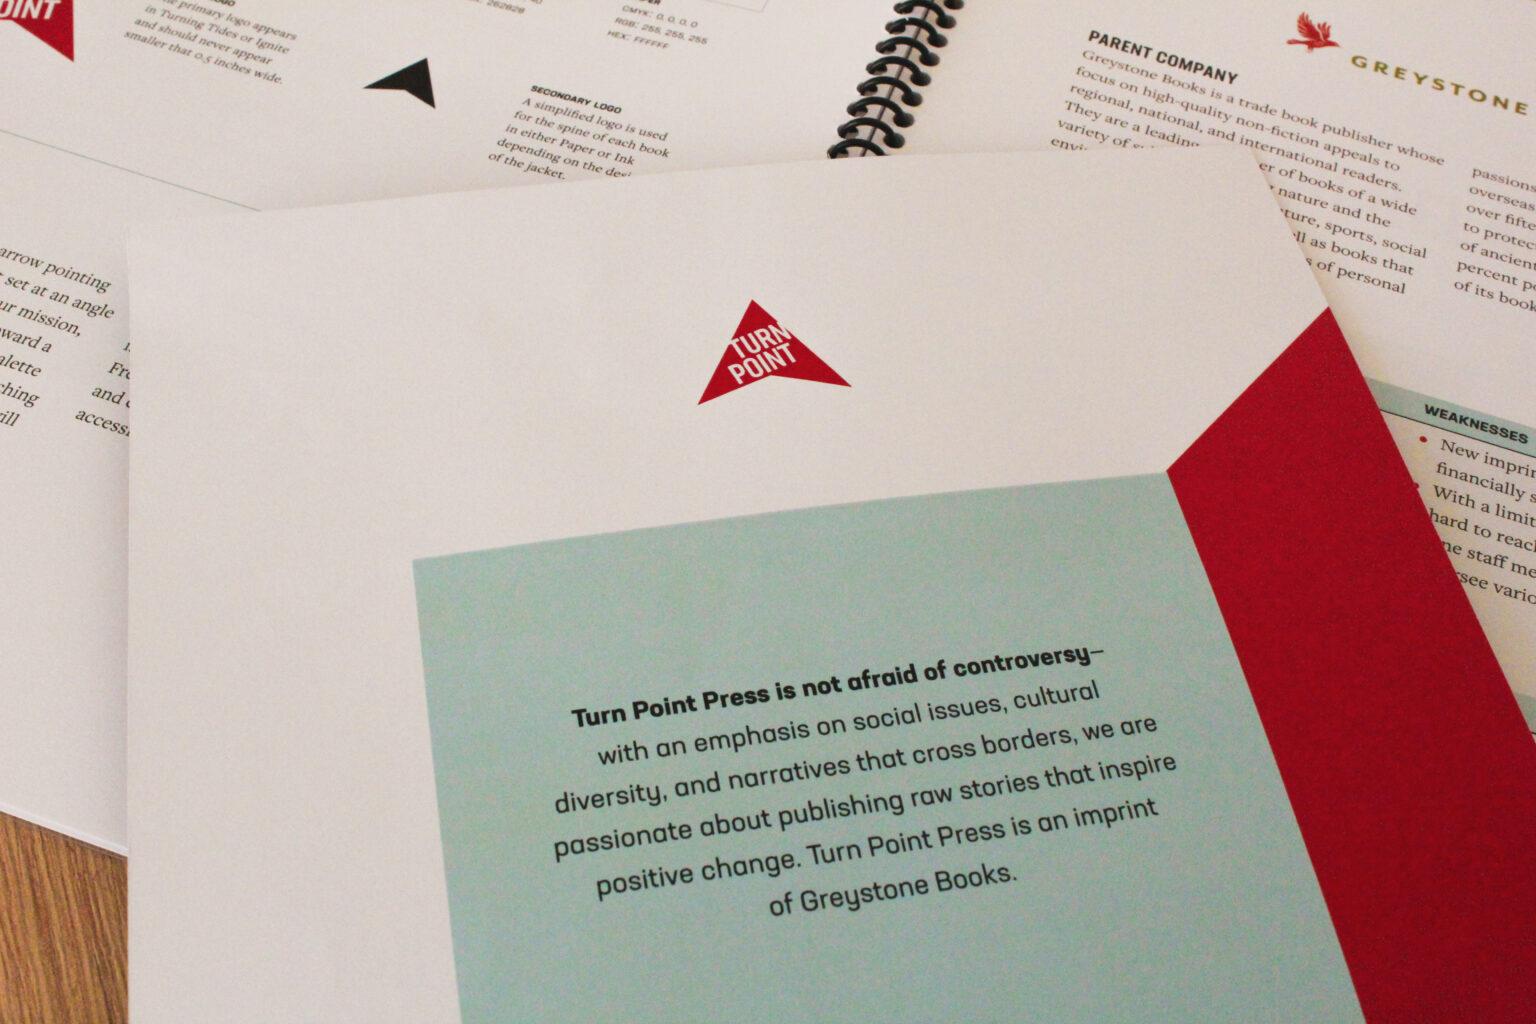 Turn Point Press project materials – mission statement